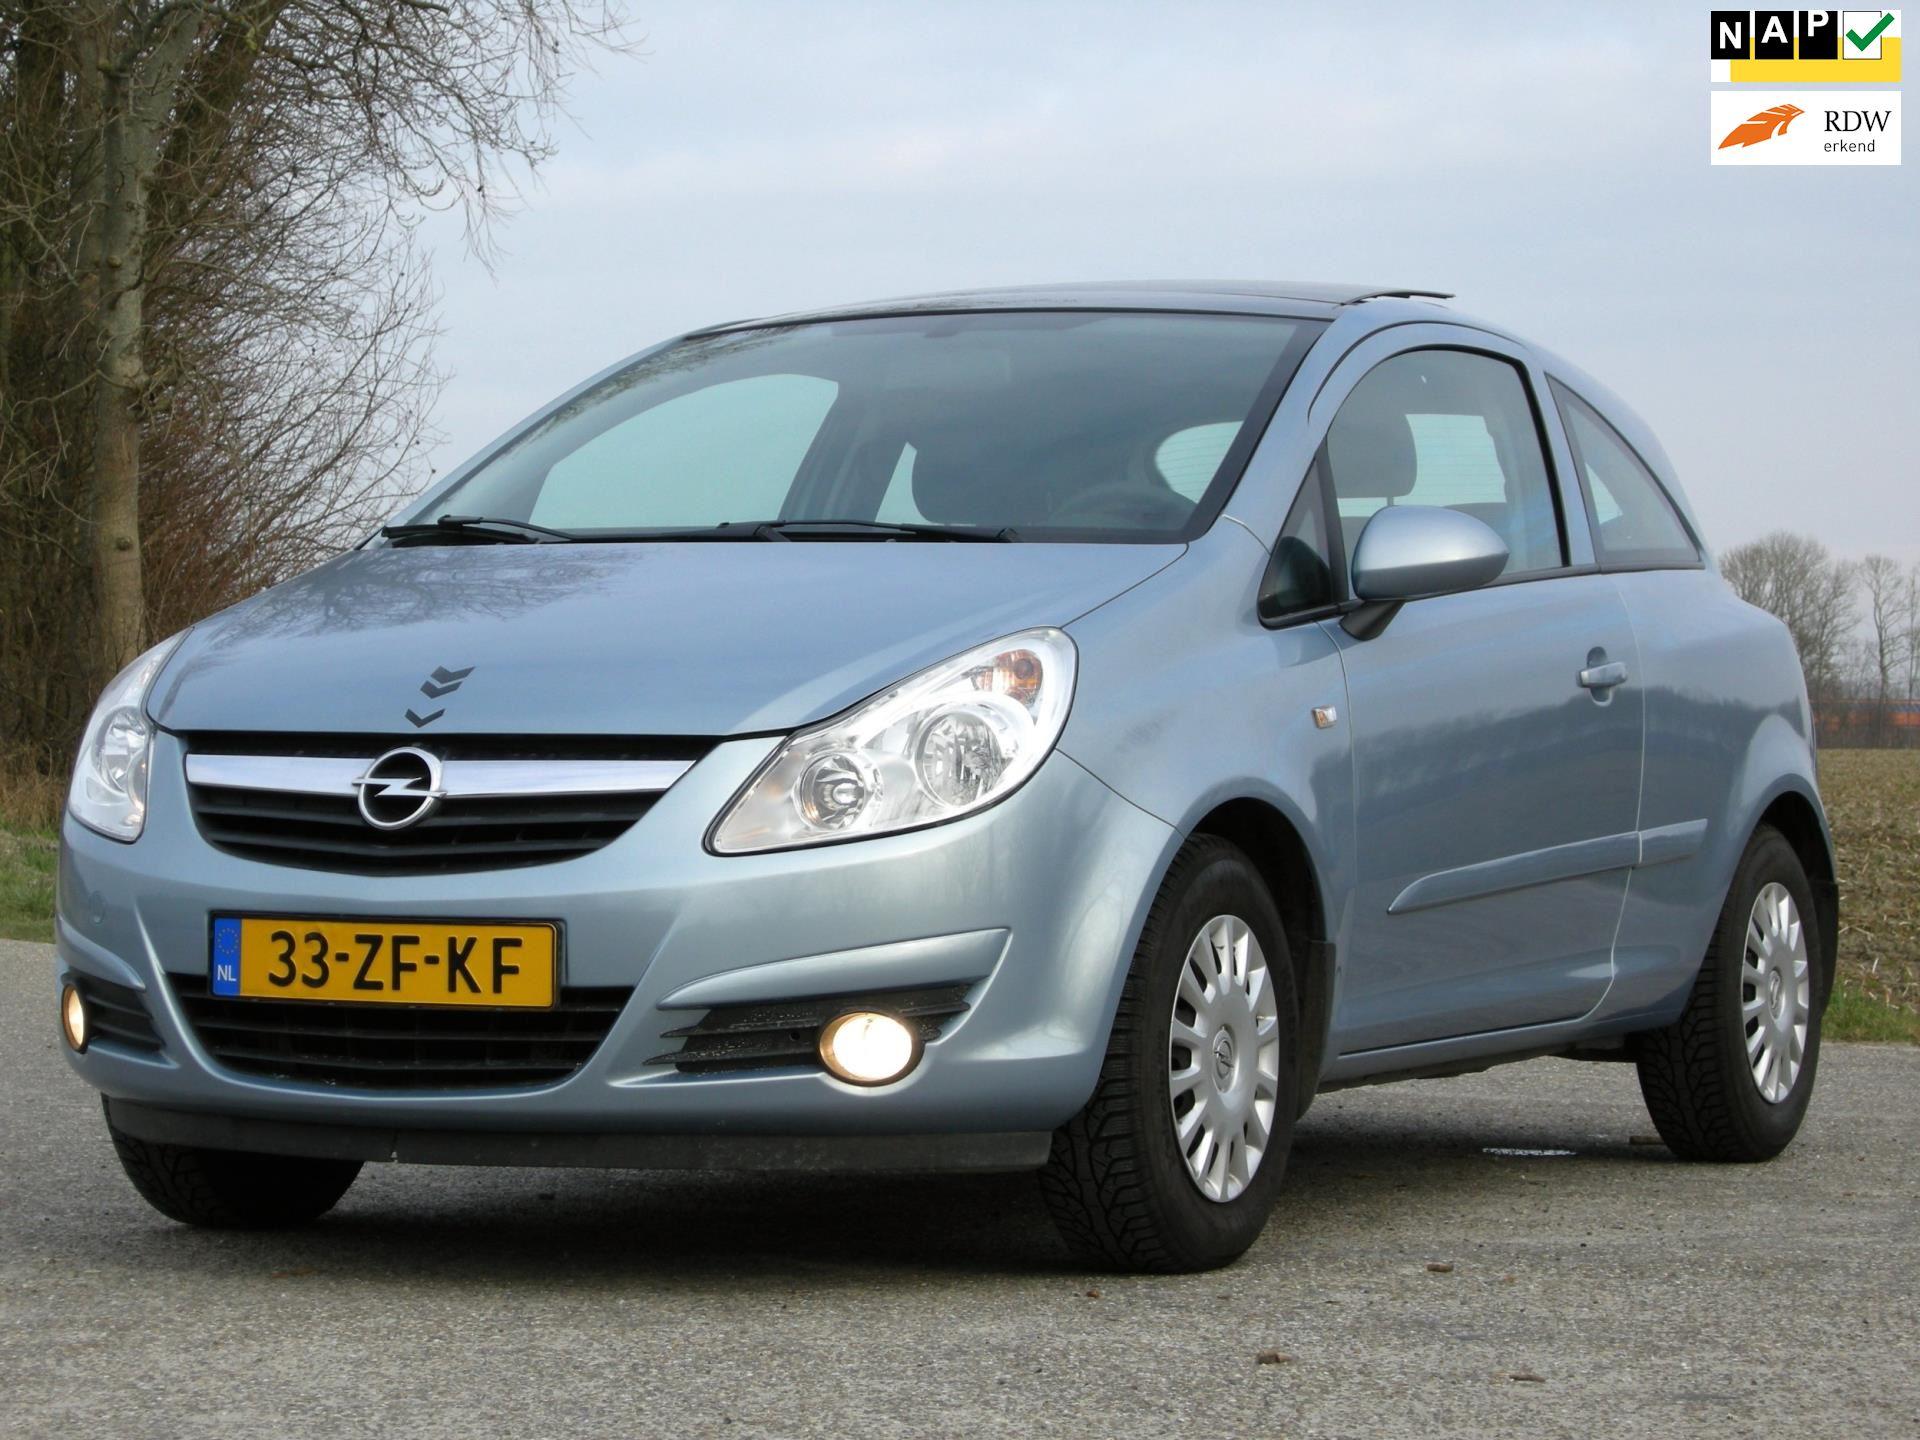 Opel Corsa occasion - Autobedrijf Jan Wisse